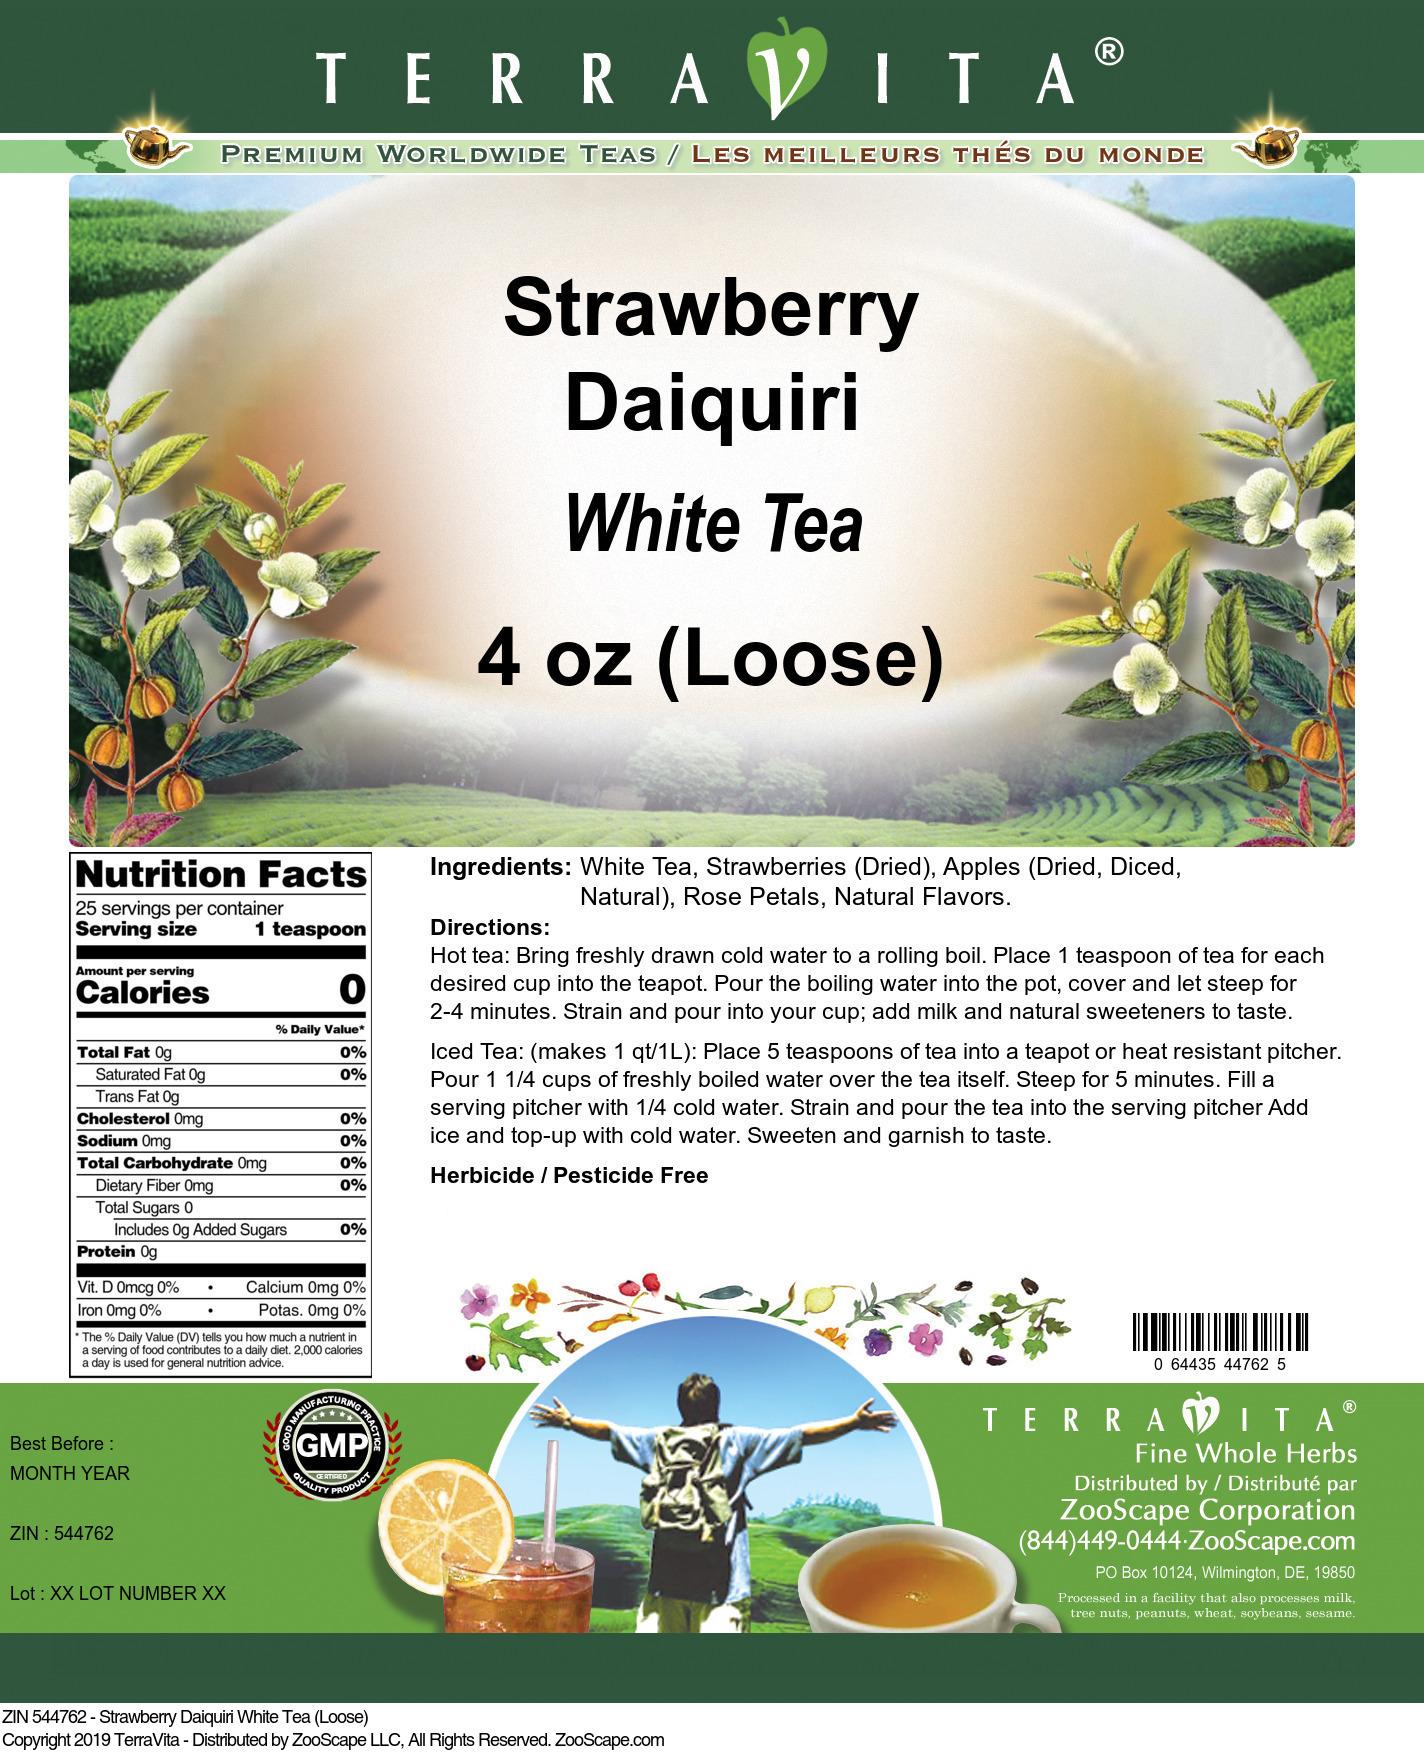 Strawberry Daiquiri White Tea (Loose)